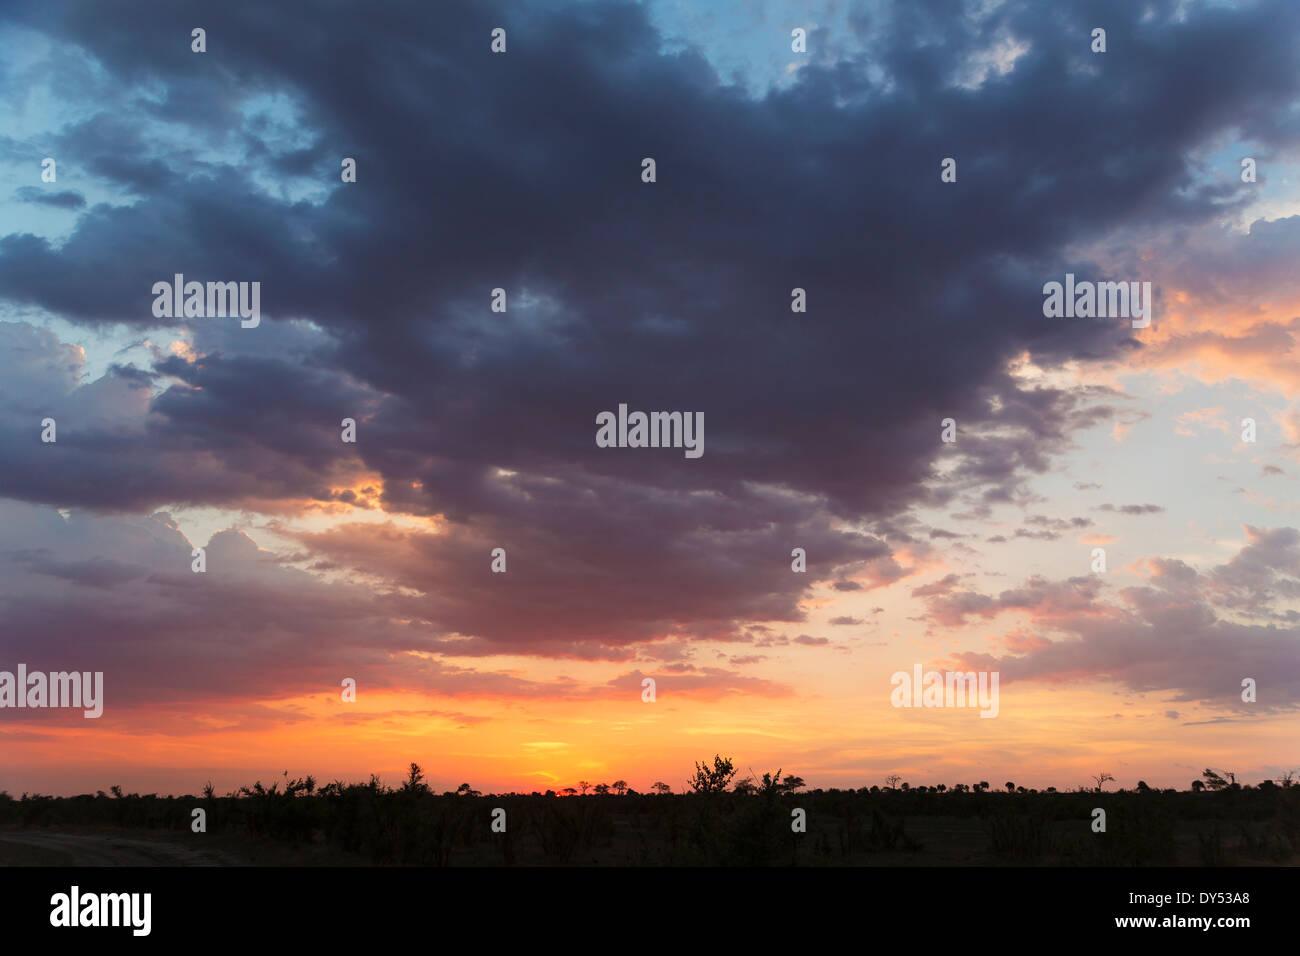 Silhouetted landscape at sunset, Kasane, Chobe National Park, Botswana, Africa - Stock Image